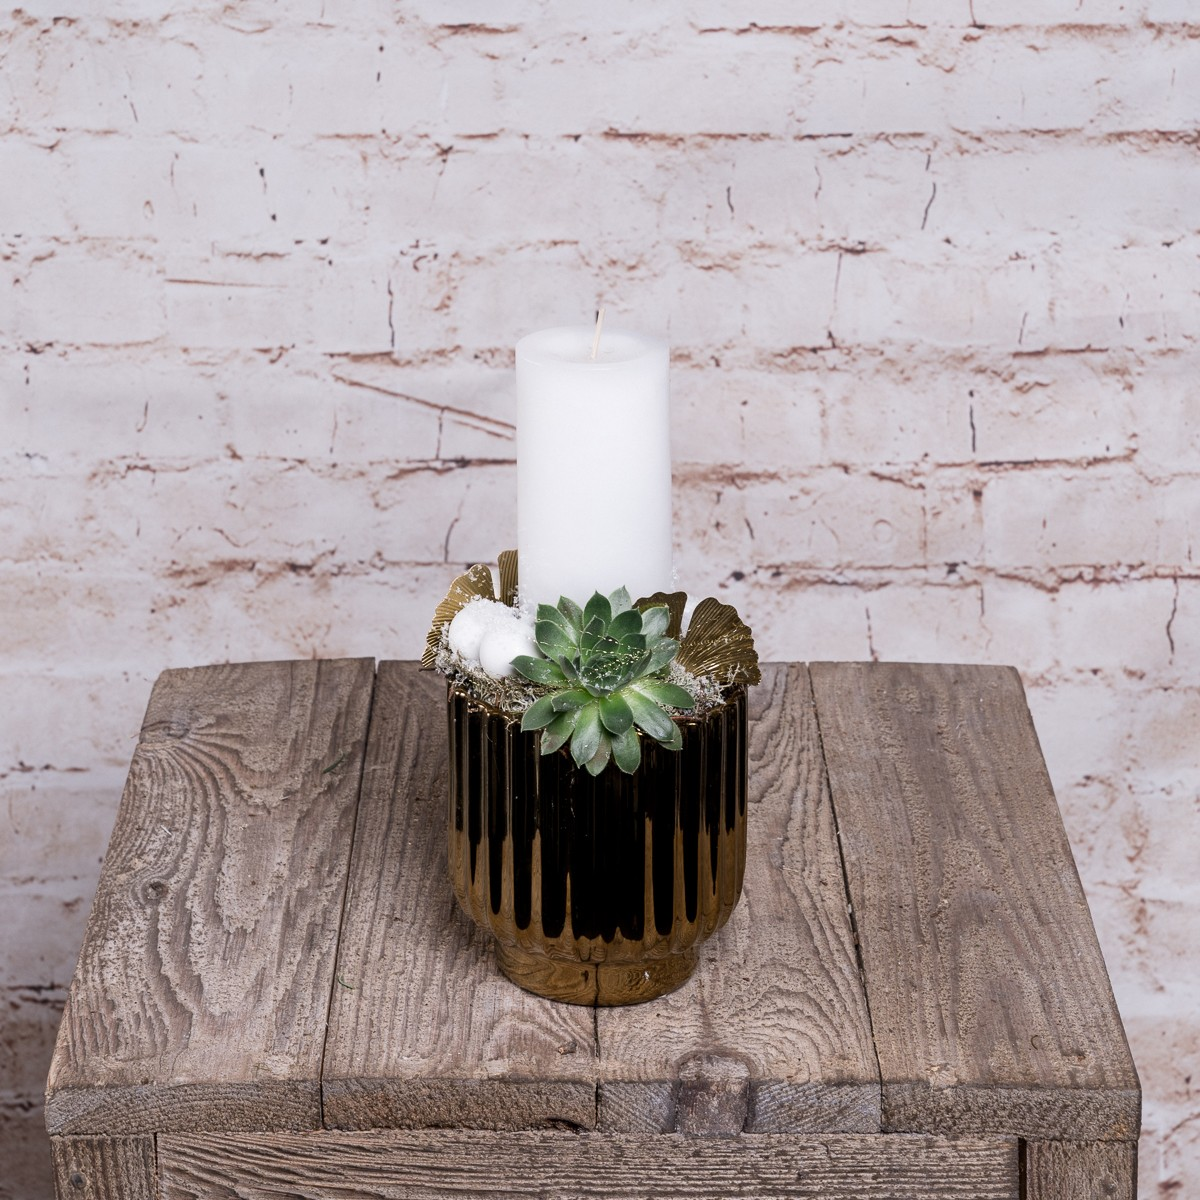 Kerzengesteck in Weiß-Gold Bild 1